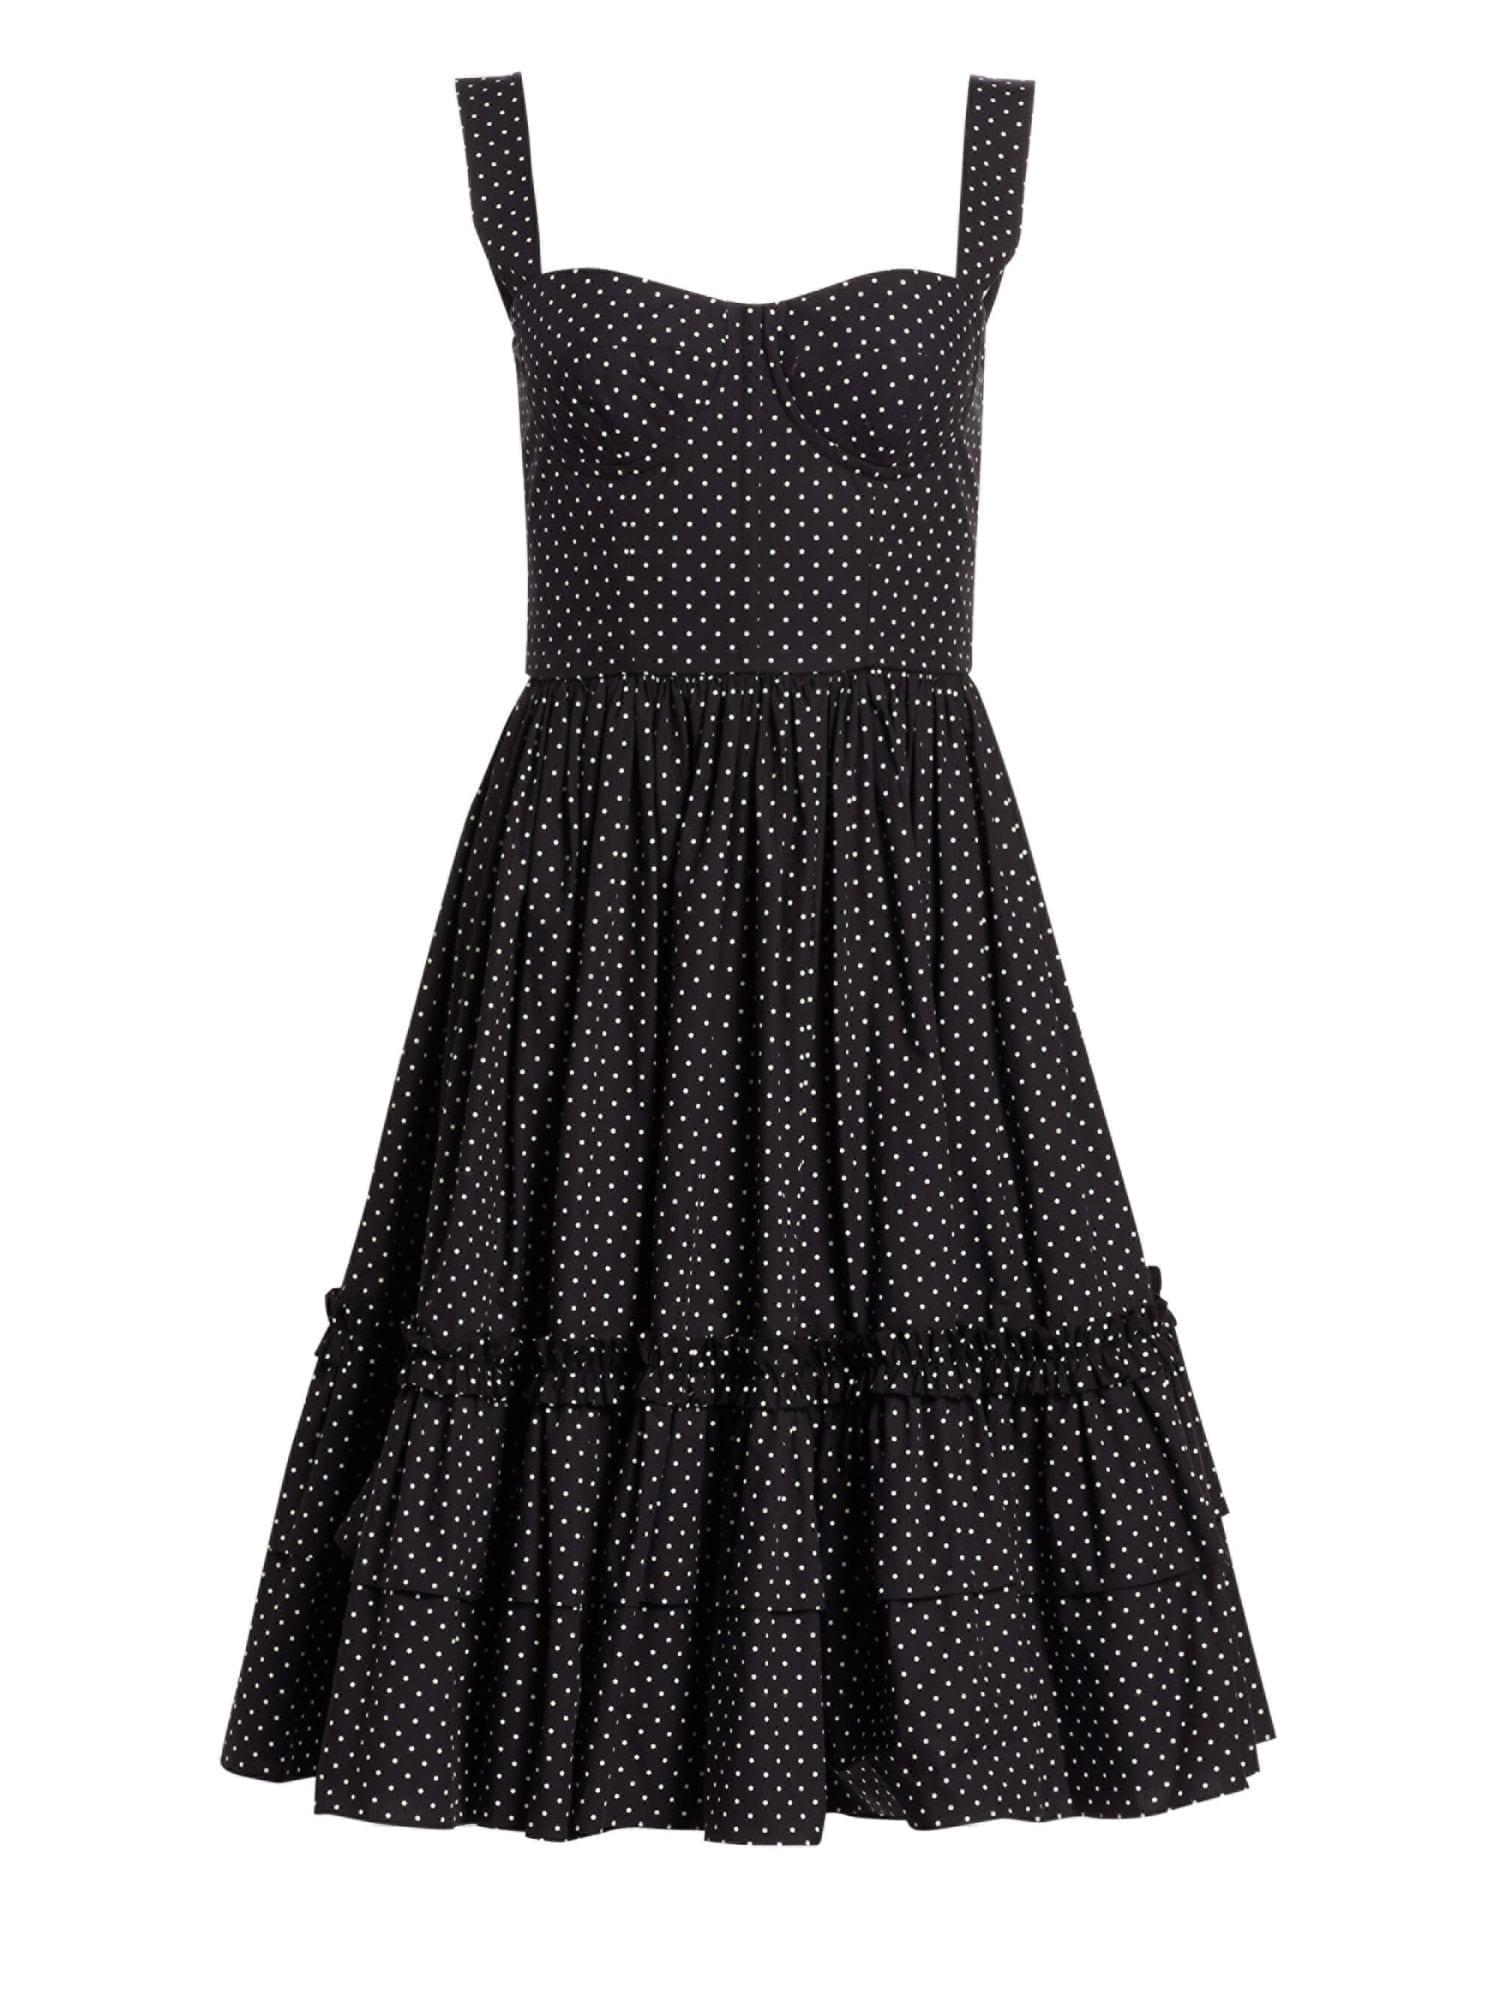 401e8cd4 DOLCE & GABBANA Polka Dot Bustier Ruffle Hem Black Dress - We Select ...